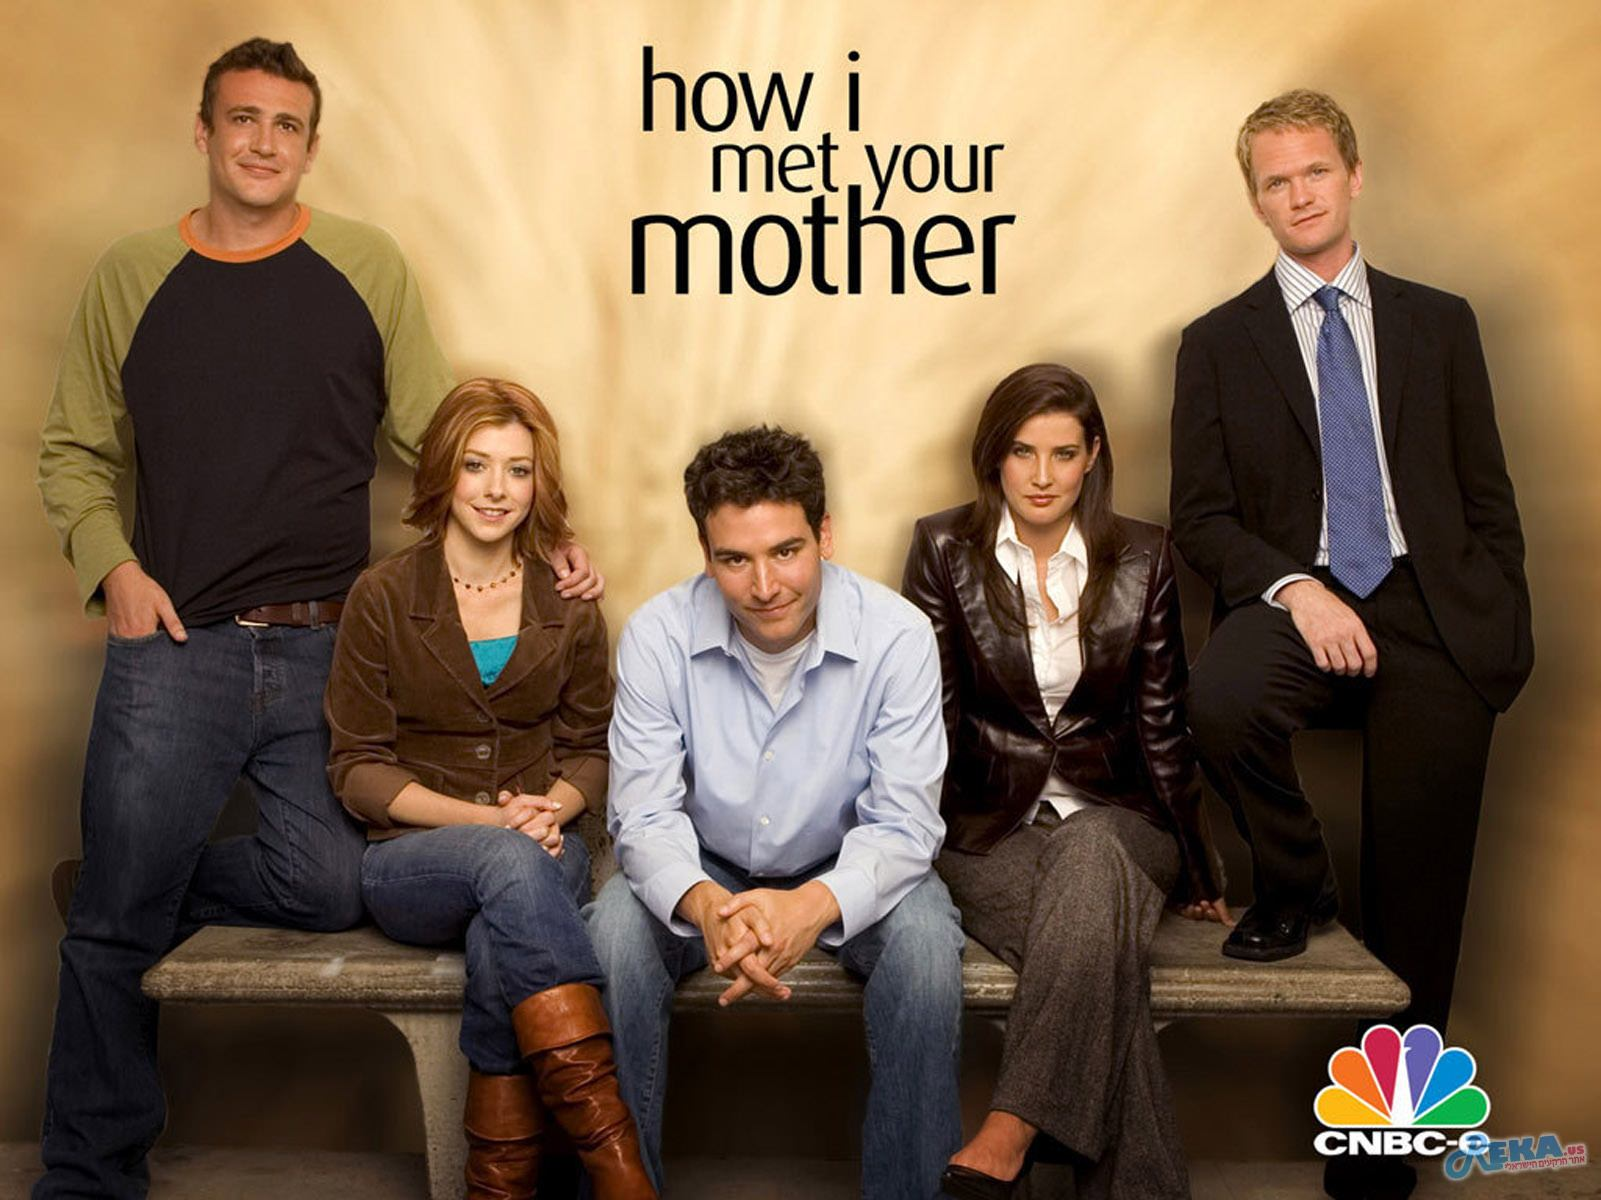 How-I-Met-Your-Mother-how-i-met-your-mother-8263303-1024-768